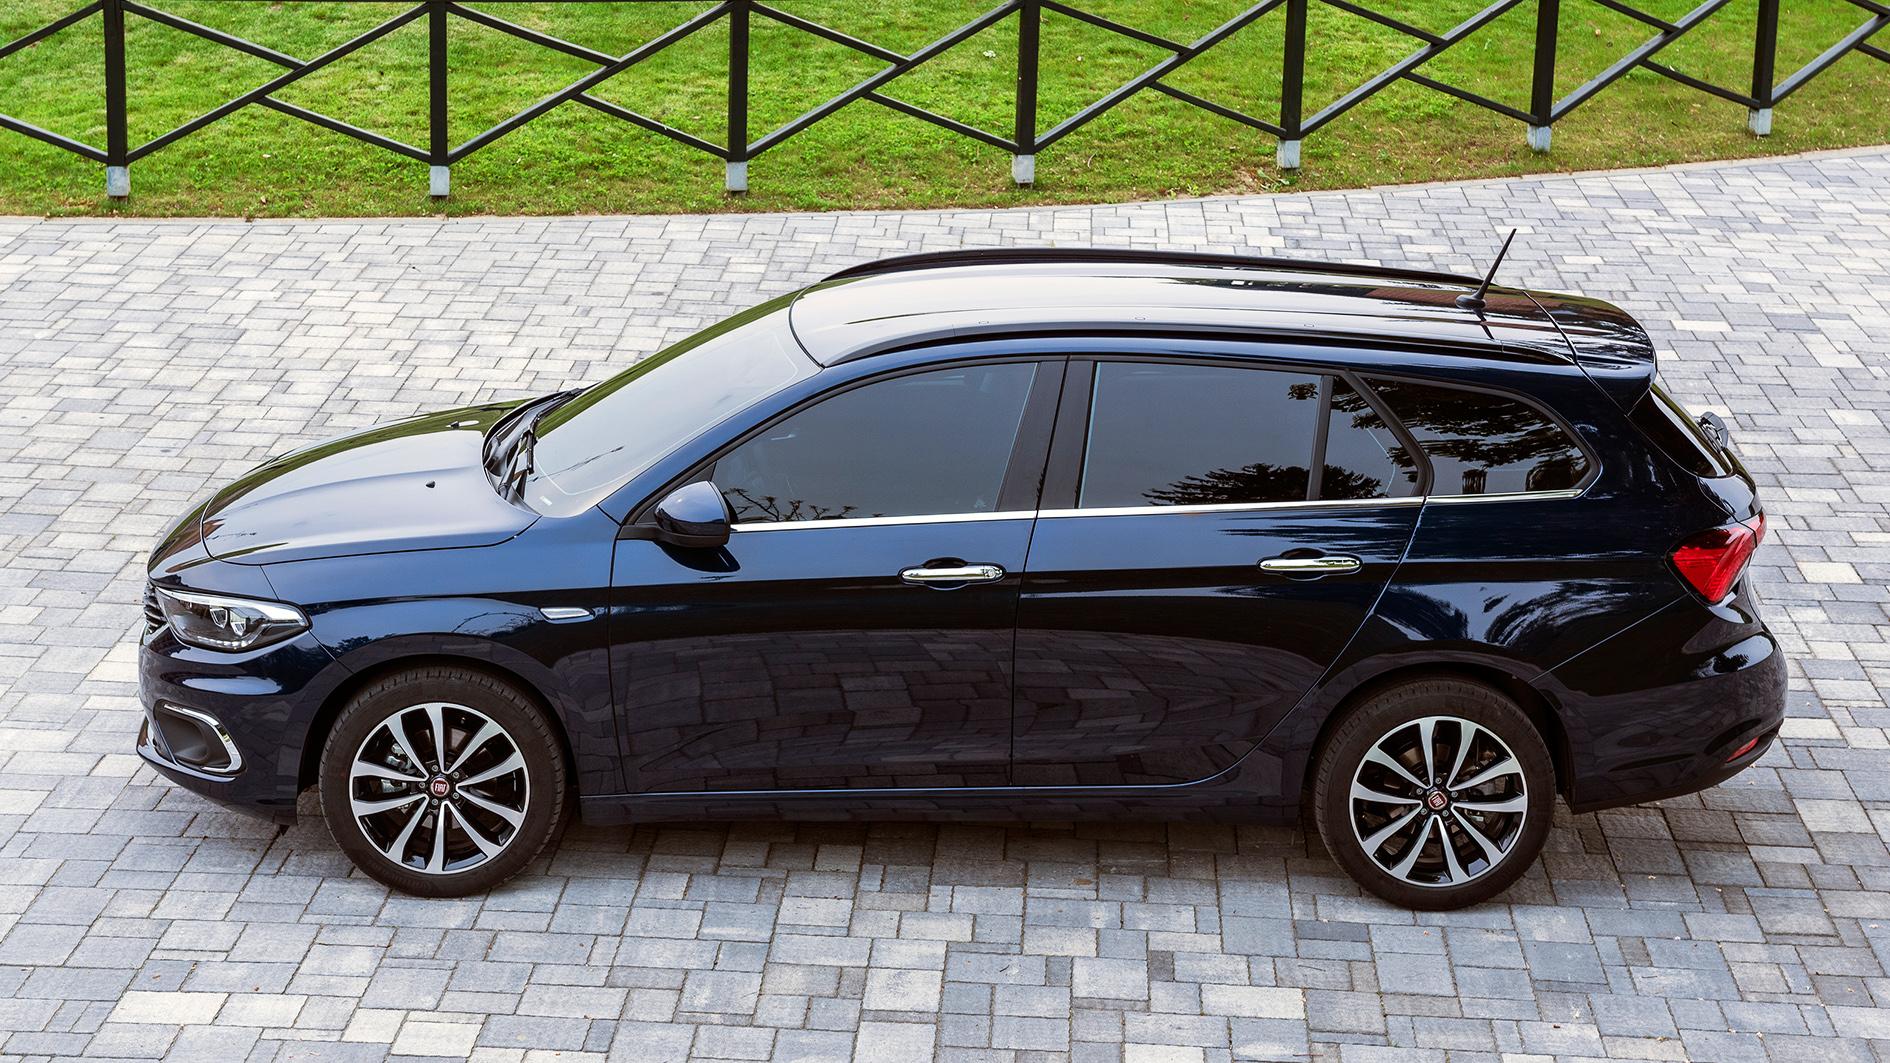 fiat tipo kombi dct test fahrbericht 2017 auto deutsch die autovideo. Black Bedroom Furniture Sets. Home Design Ideas